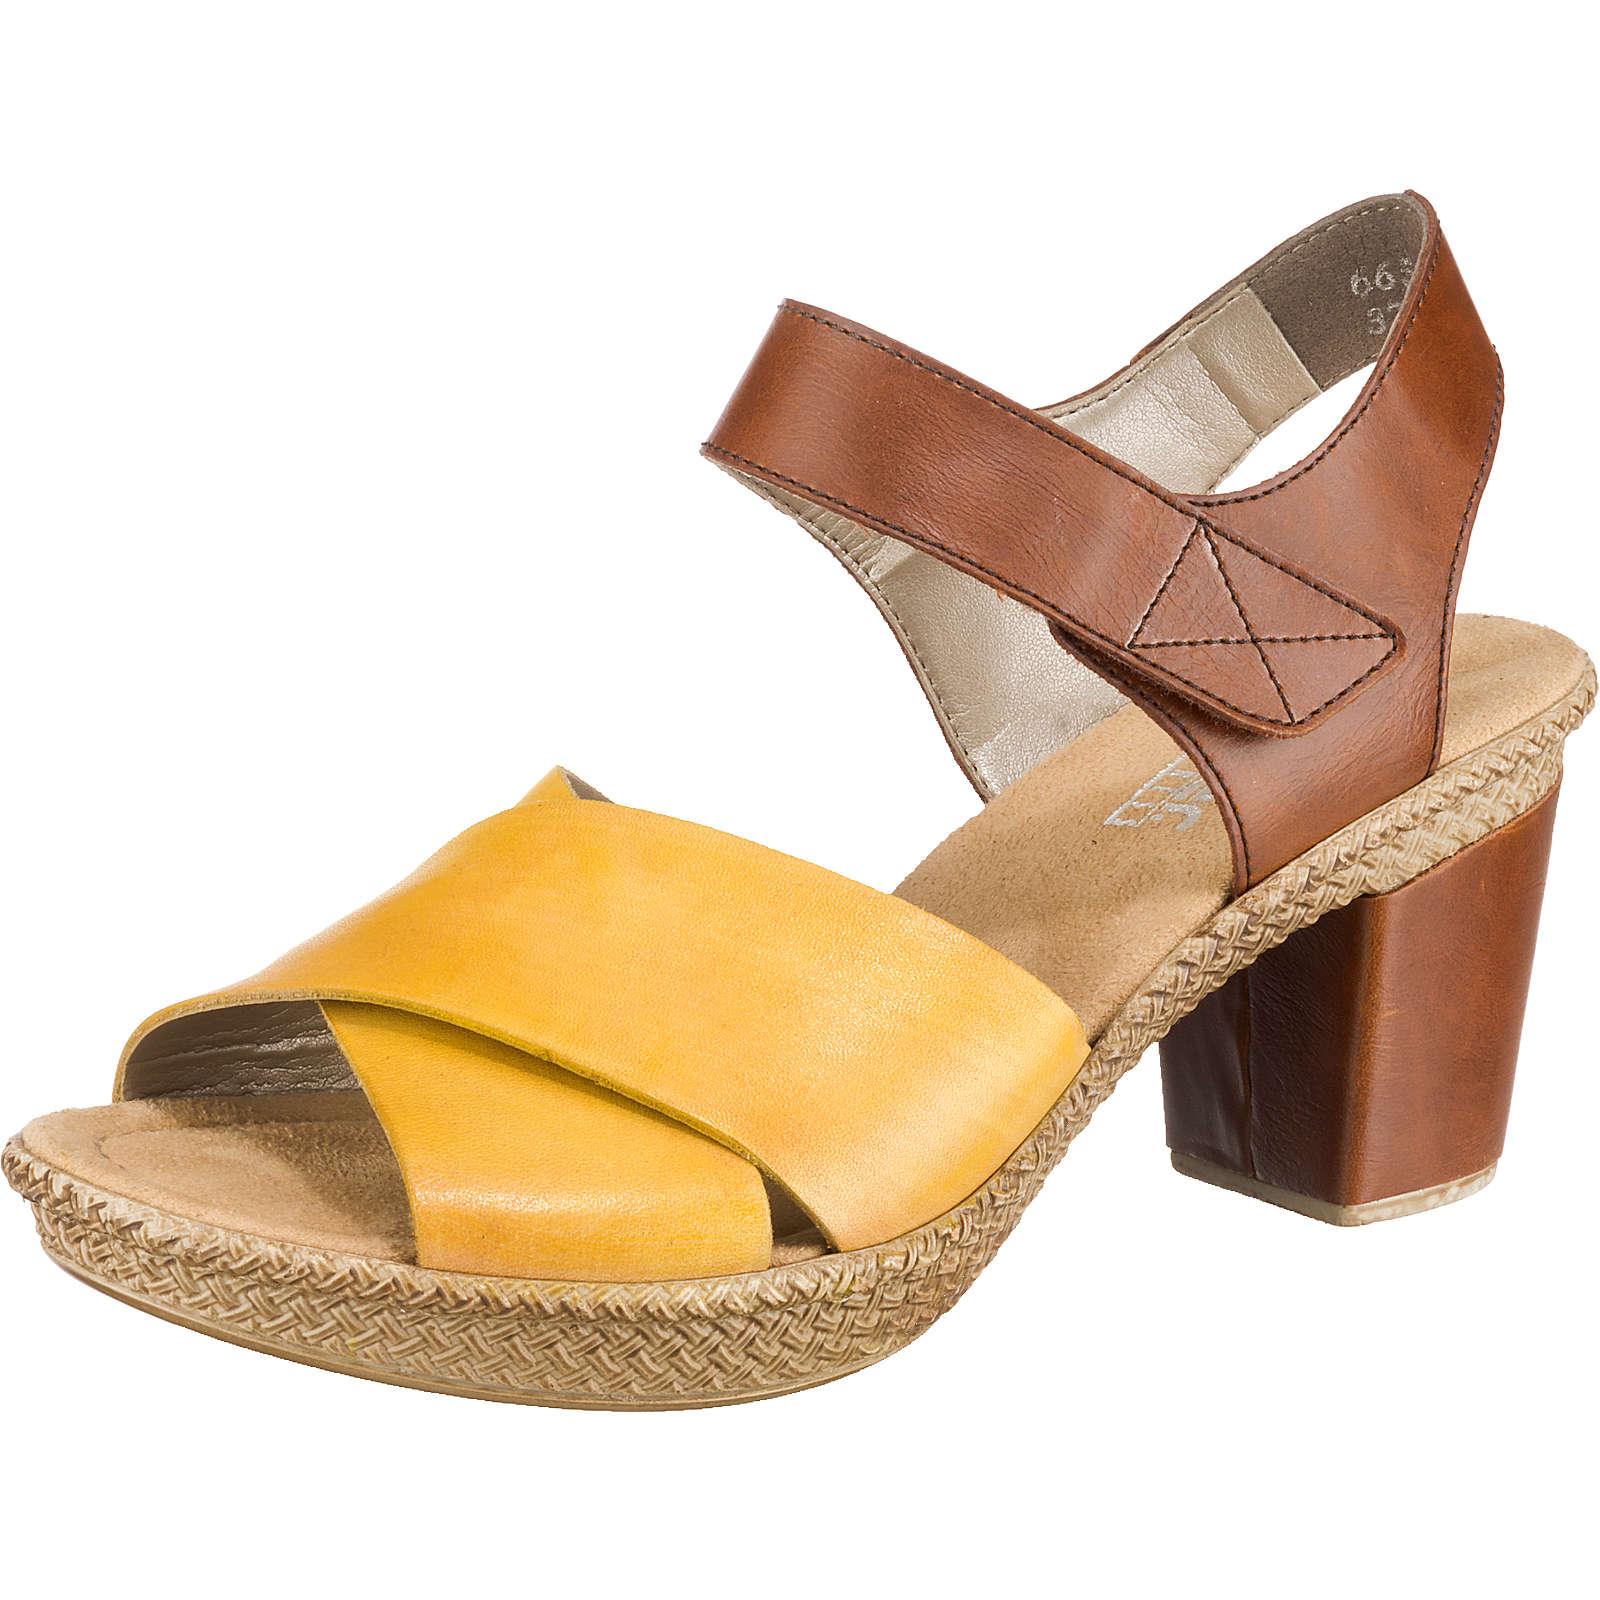 rieker Klassische Sandaletten gelb-kombi Damen Gr. 36